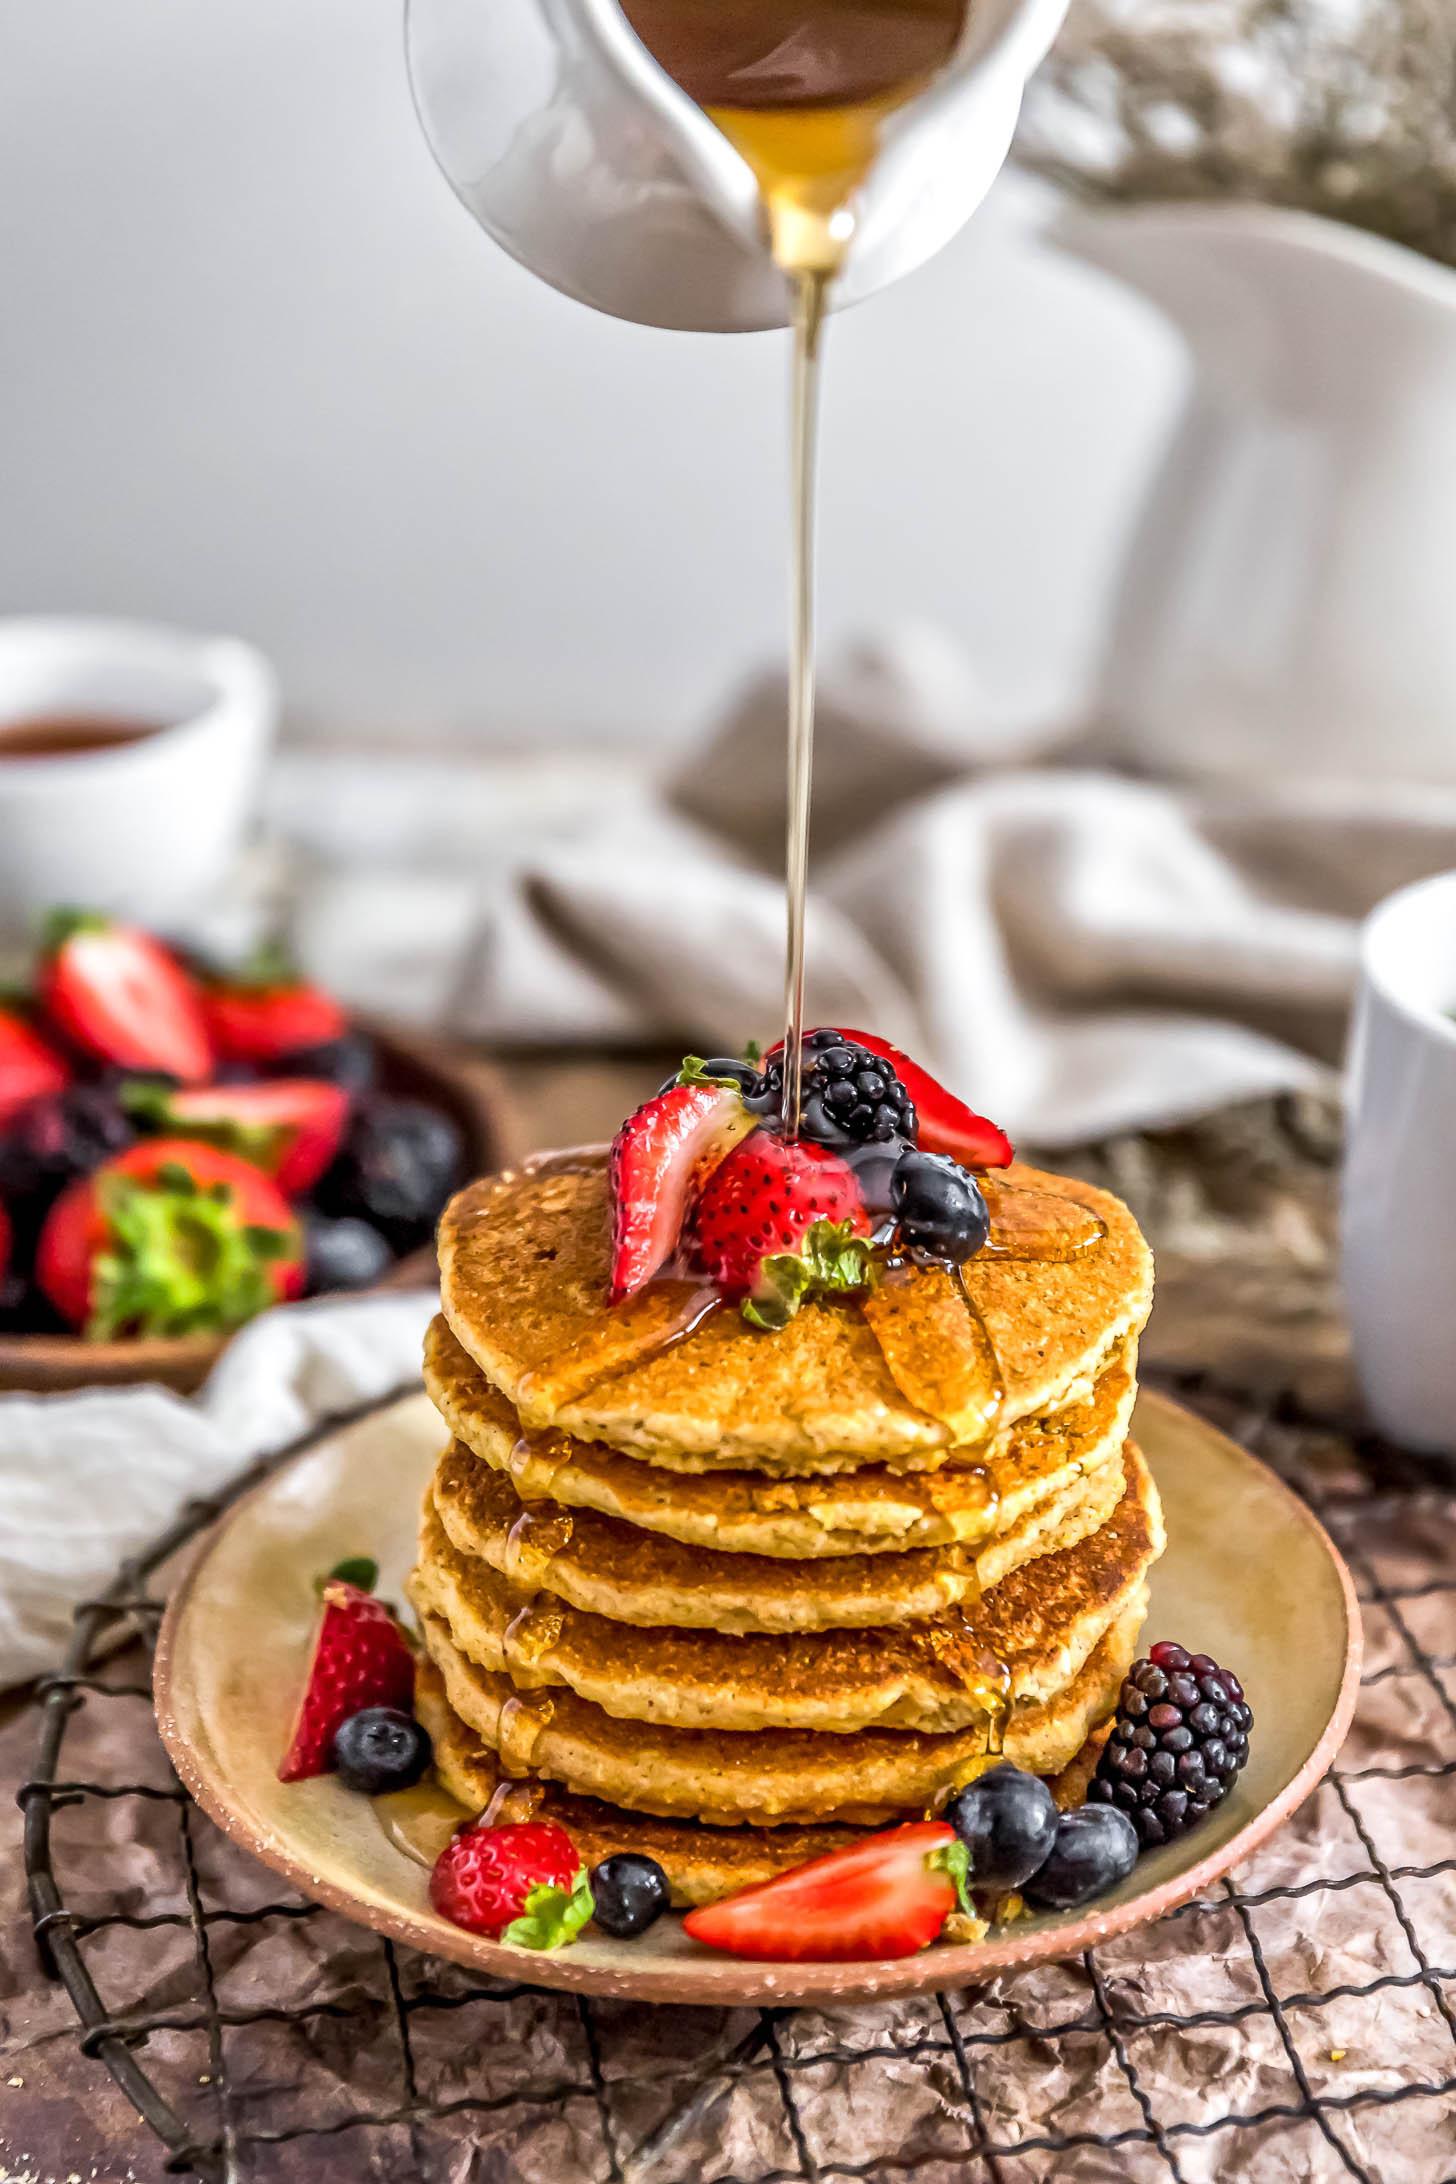 Healthy Cornmeal Pancakes  Monkey and Me s Menu 30 Monkey and Me Kitchen Adventures